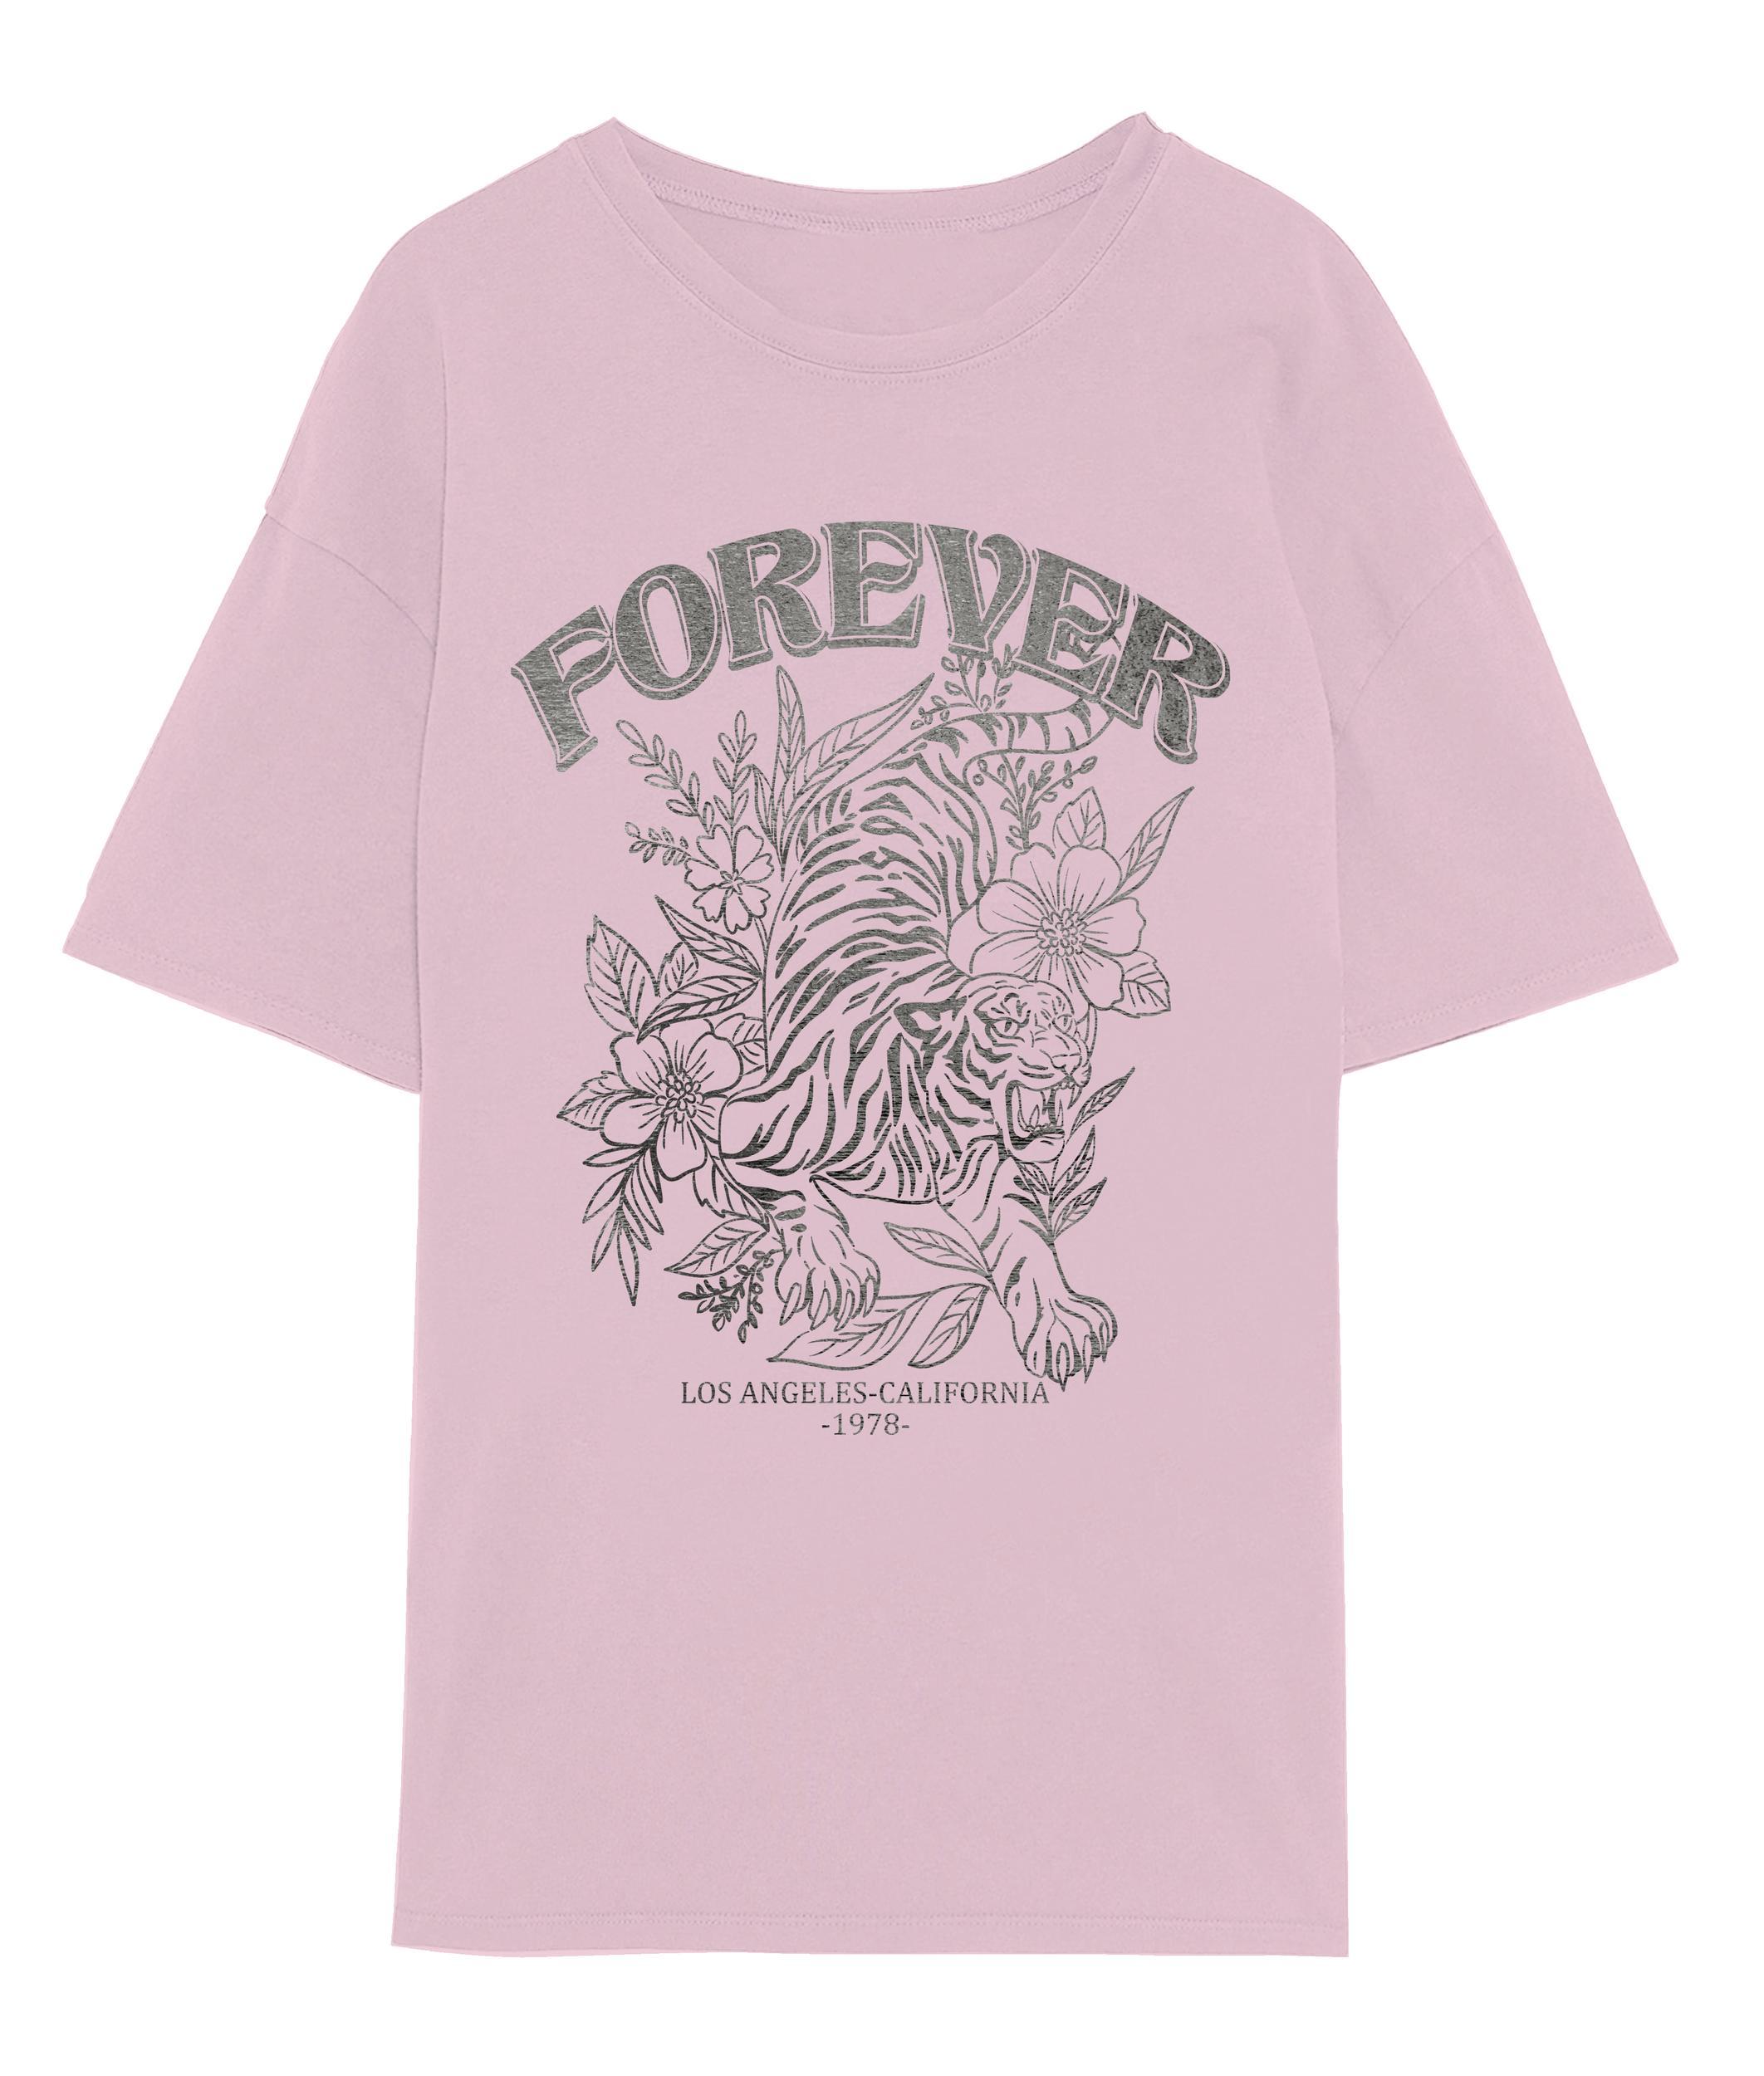 Vero Moda Forever oversized t-shirt, parfait pink, small